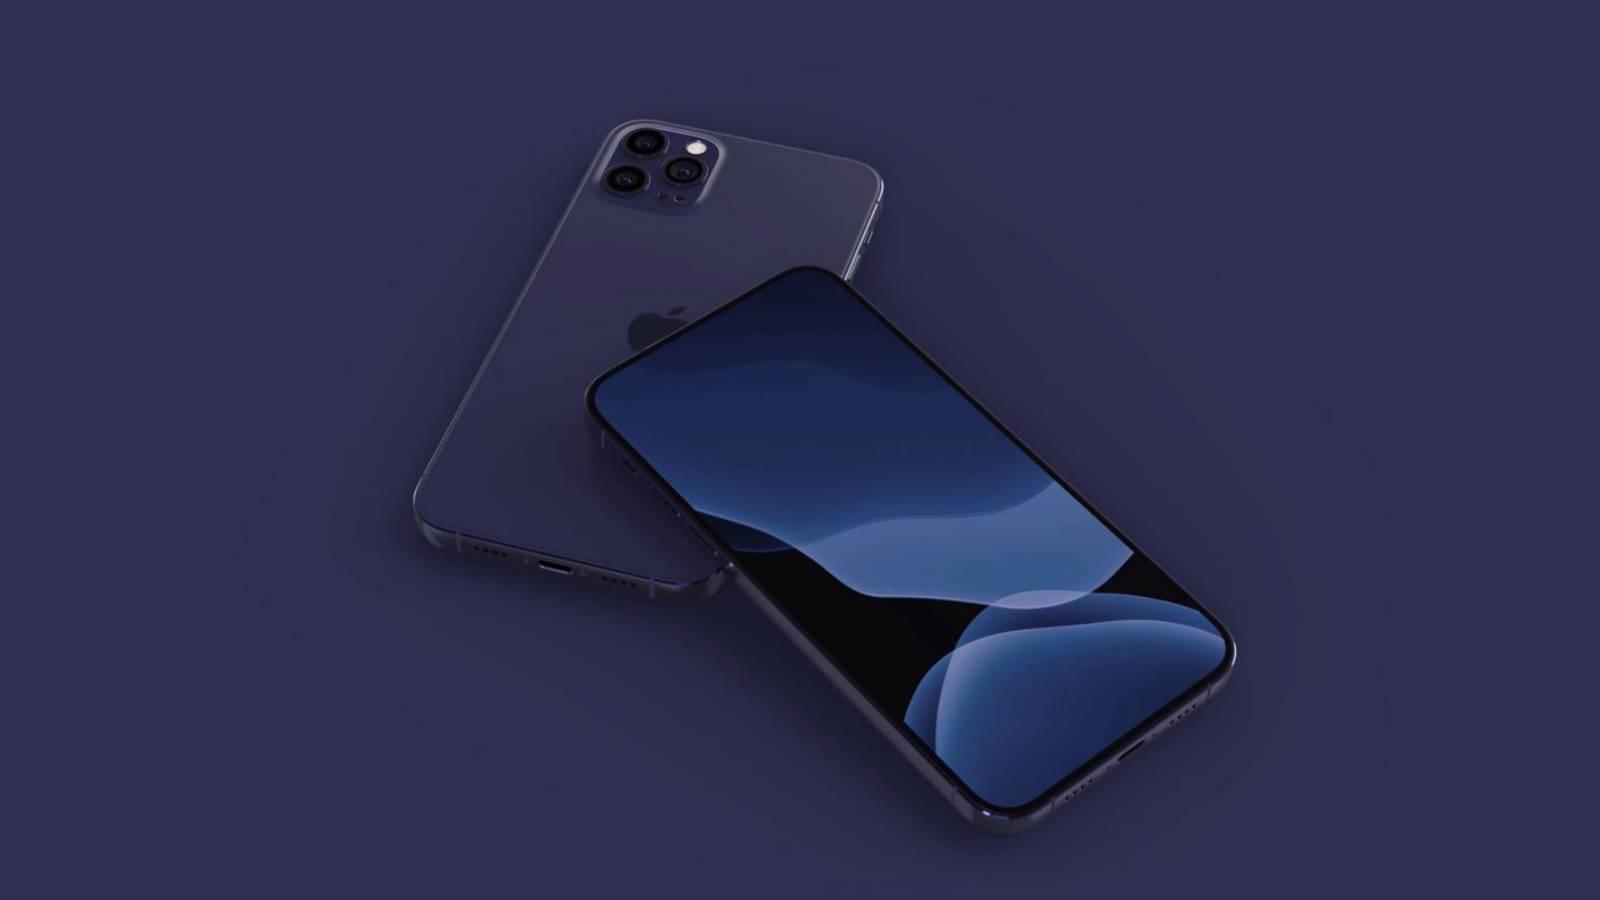 iphone 12 modem 5g productie